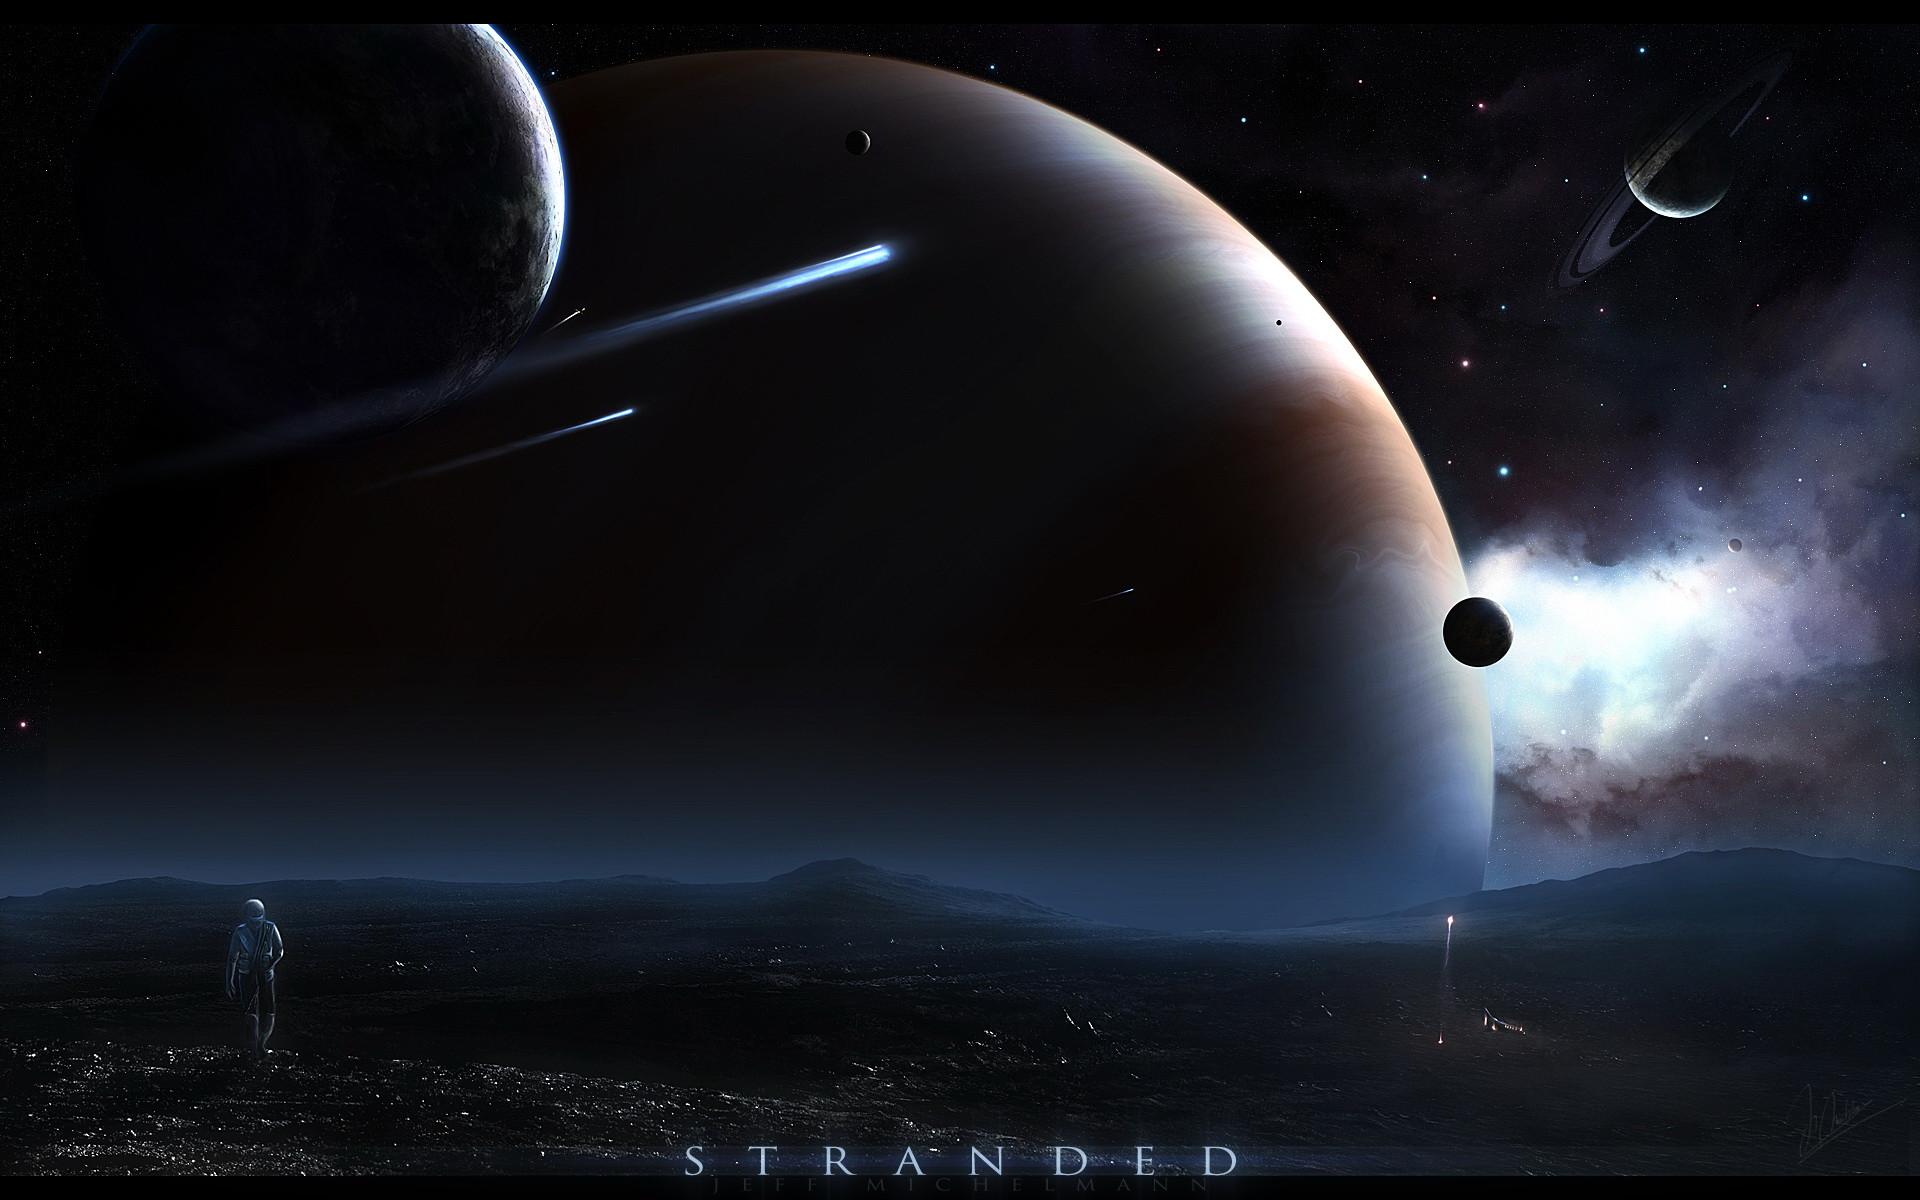 fantasy space art wallpaper img9